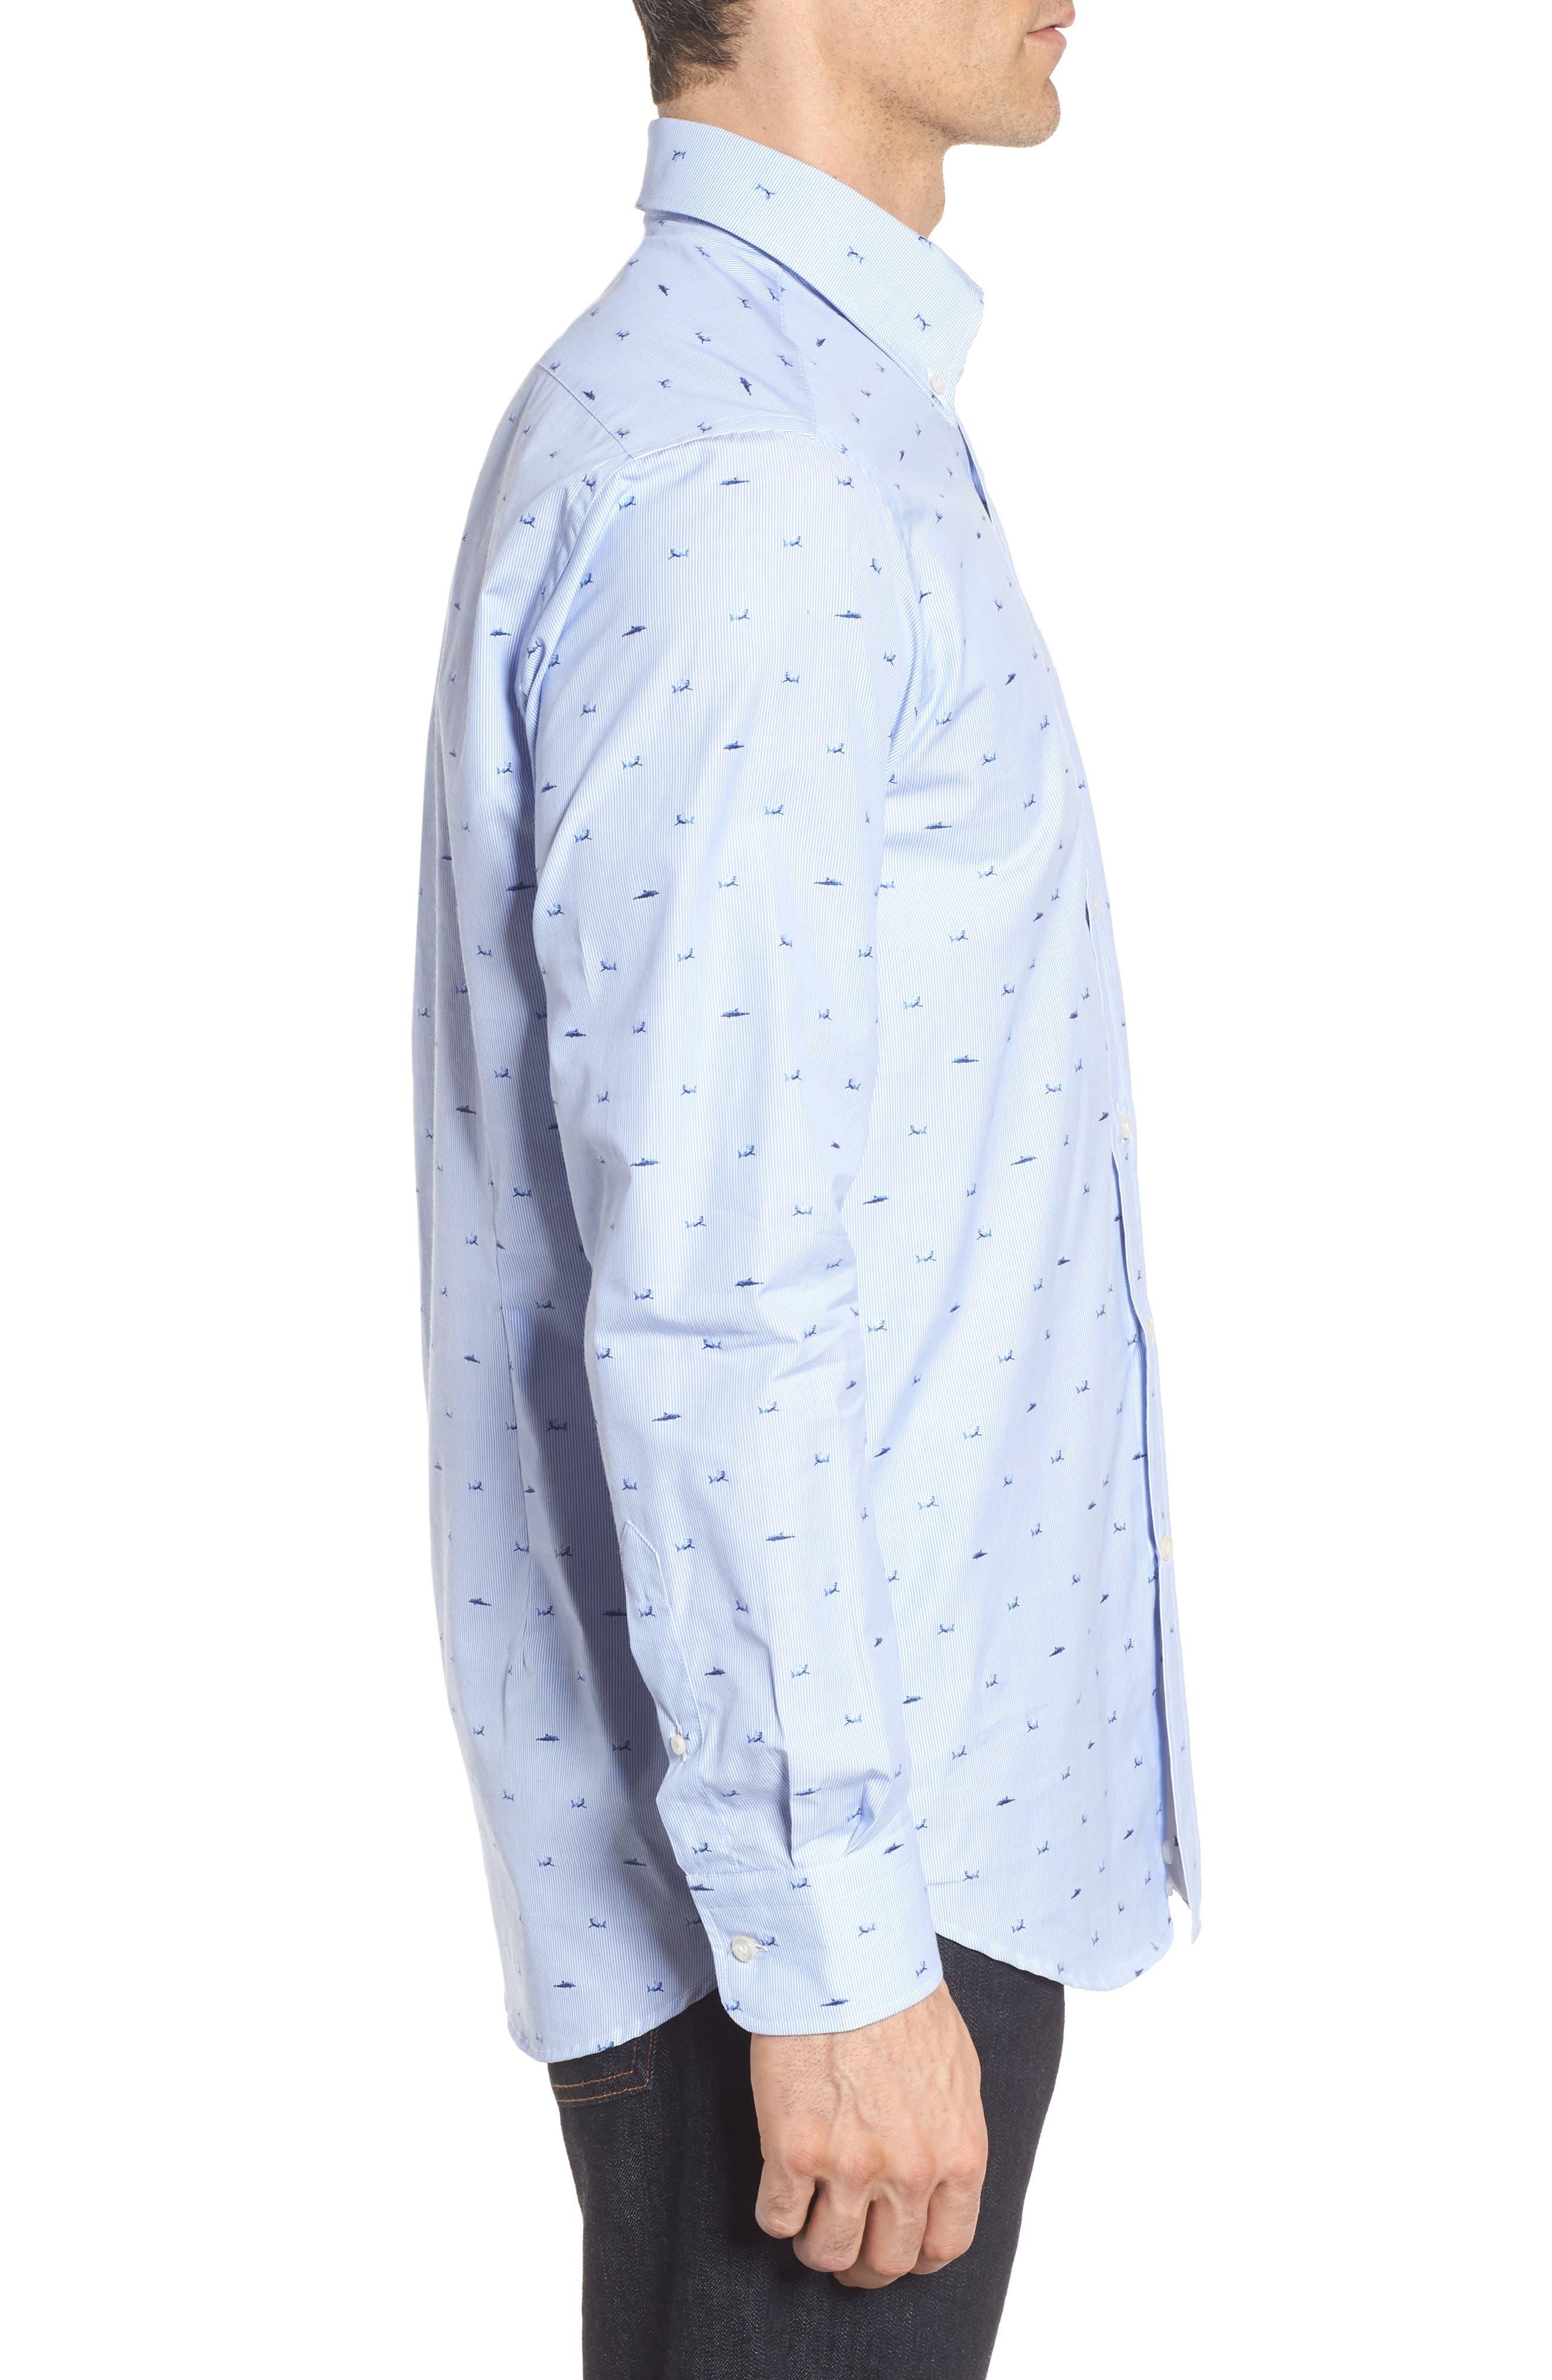 Paul&Shark Great White Jacquard Sport Shirt,                             Alternate thumbnail 4, color,                             Blue